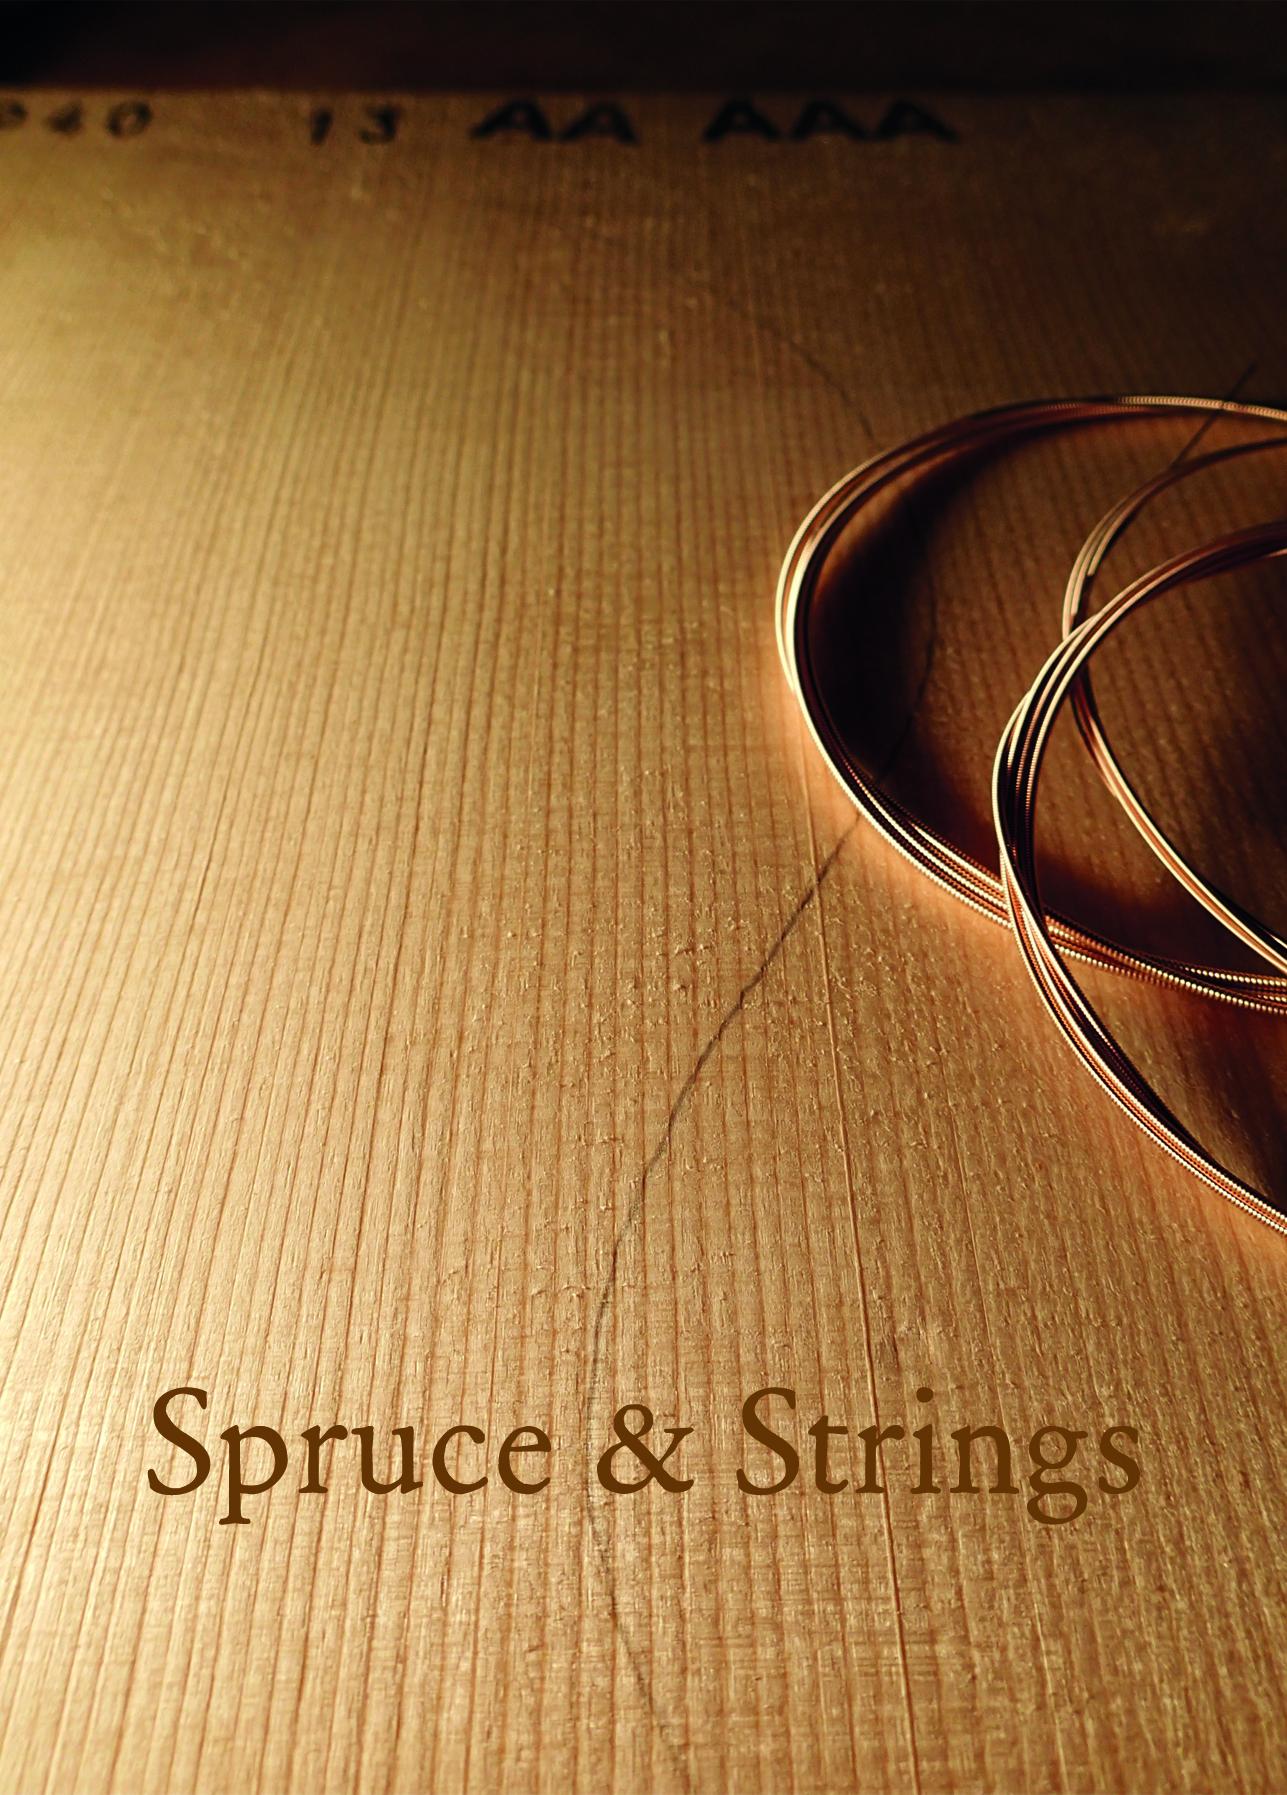 Spruce & strings A6 portrait